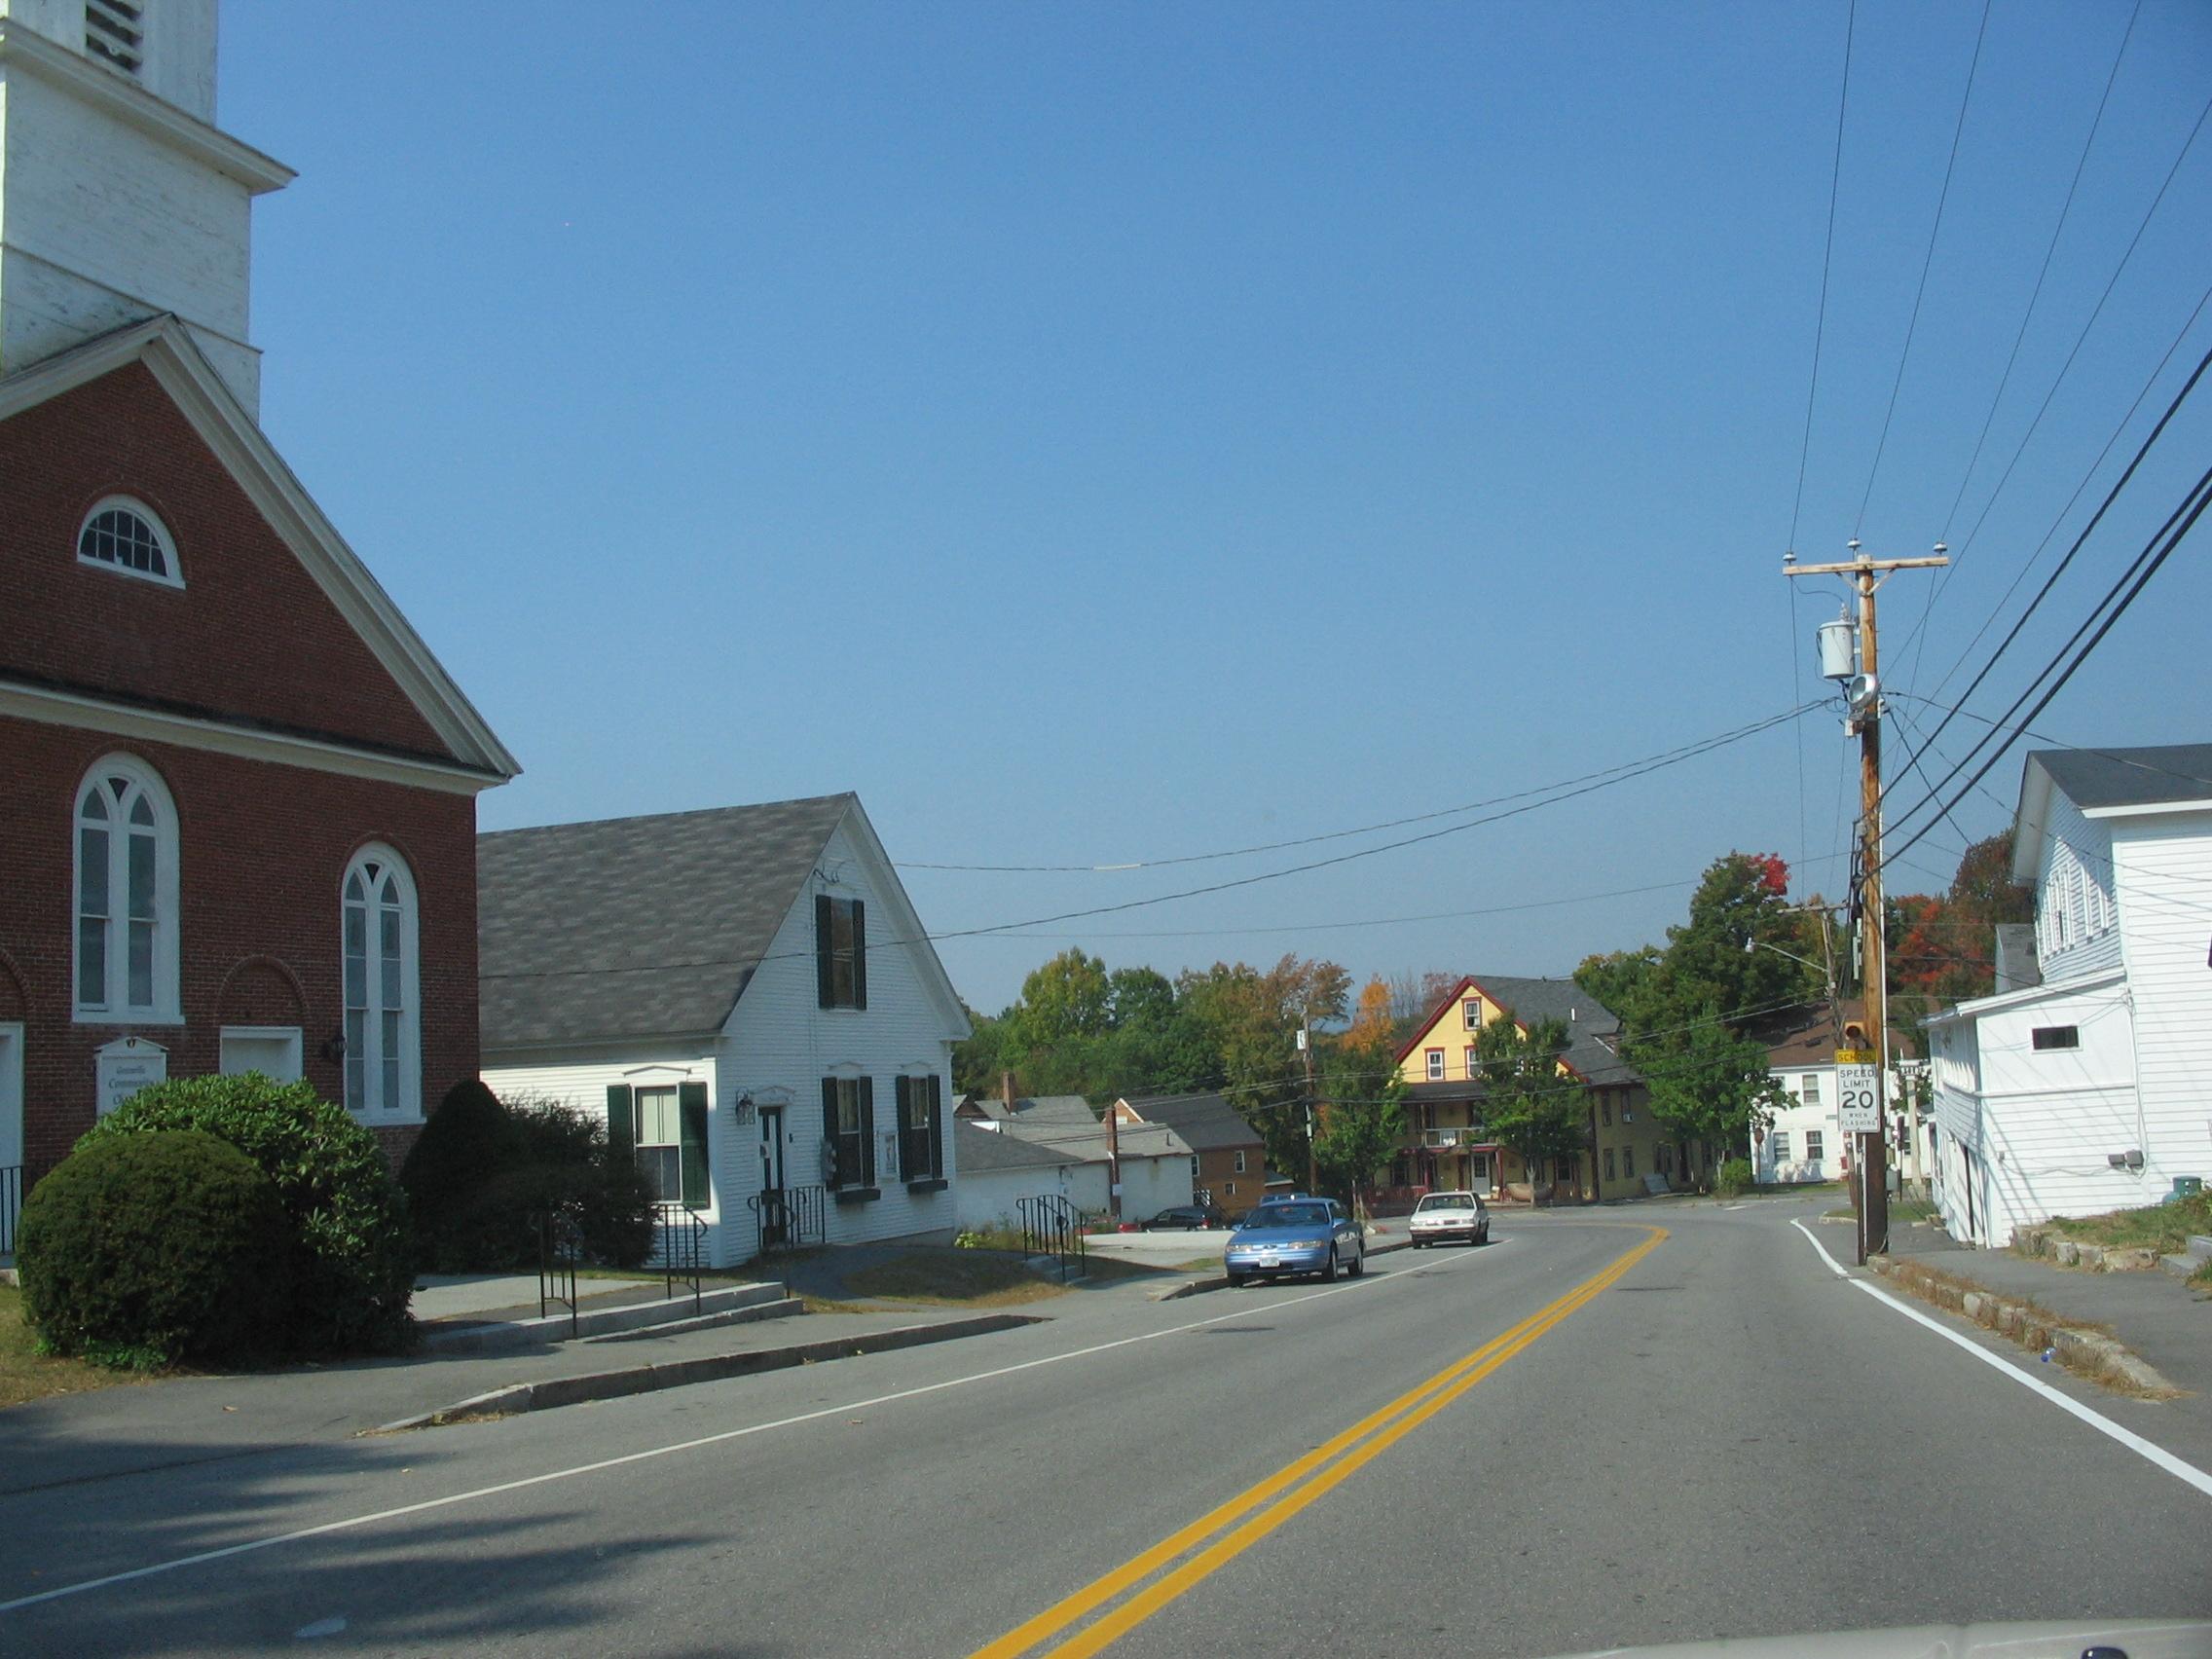 09-26-07 New Hampshire (9)